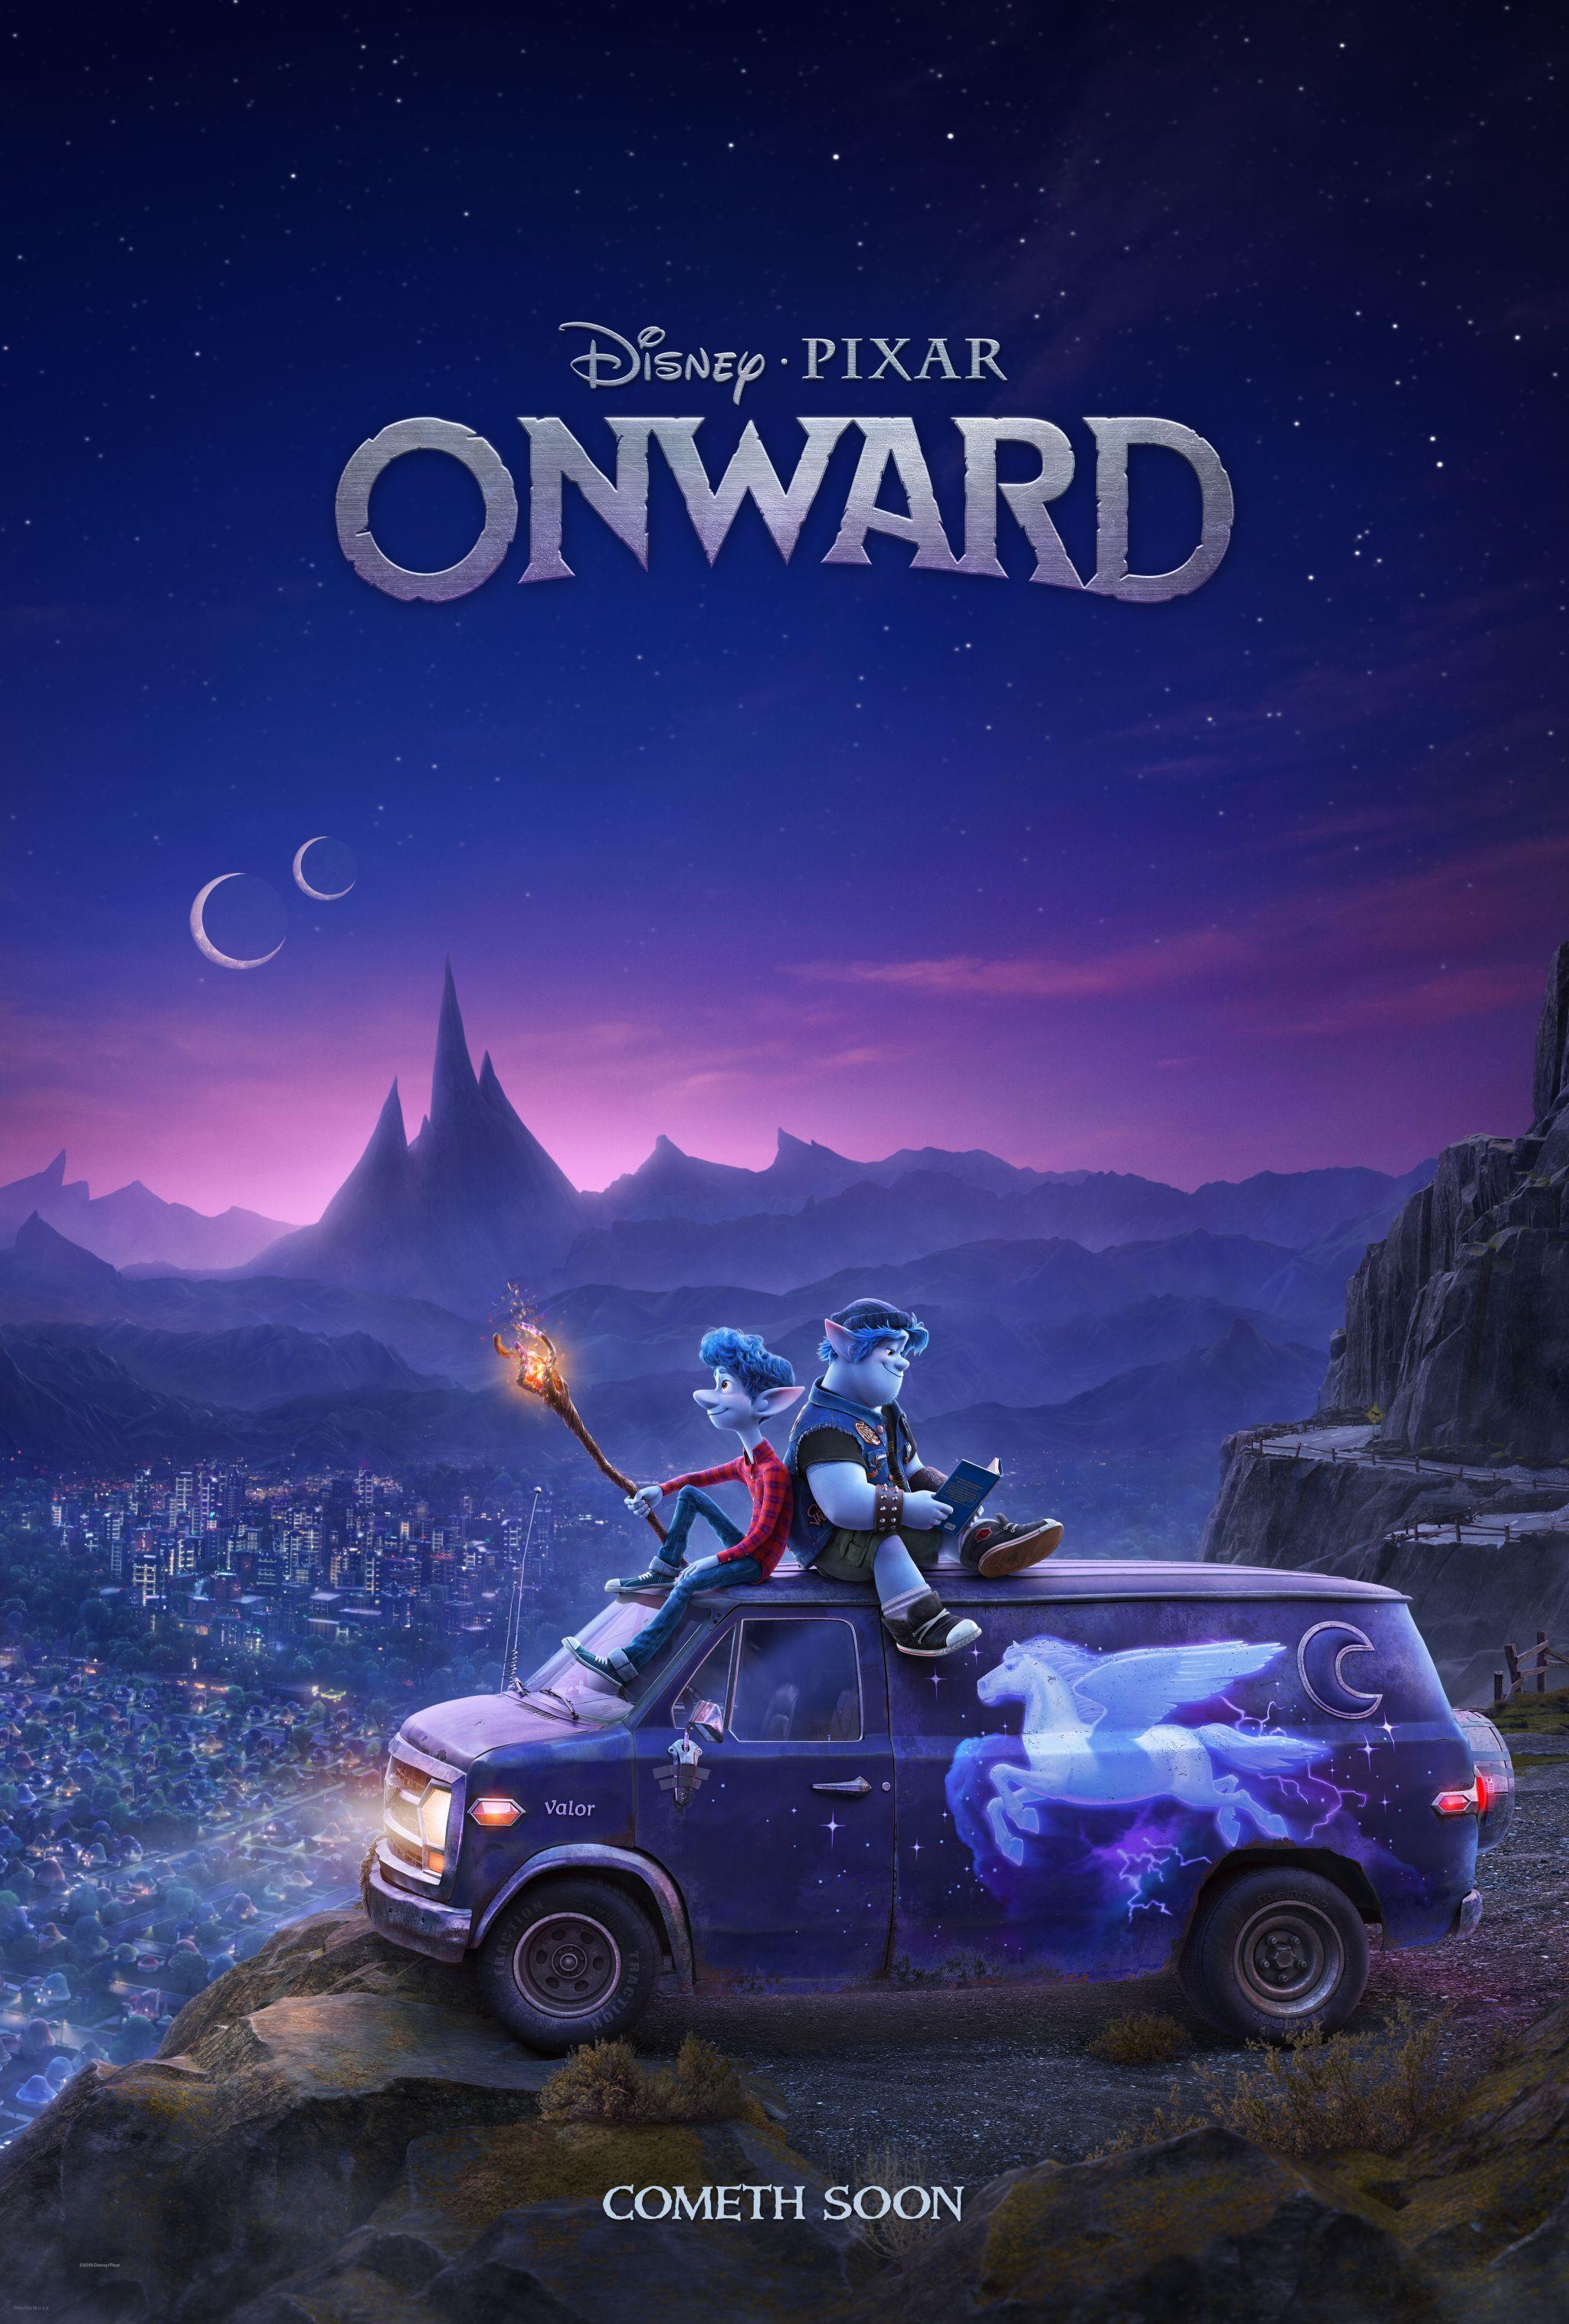 First Look Disney And Pixar S Onward With Images Pixar